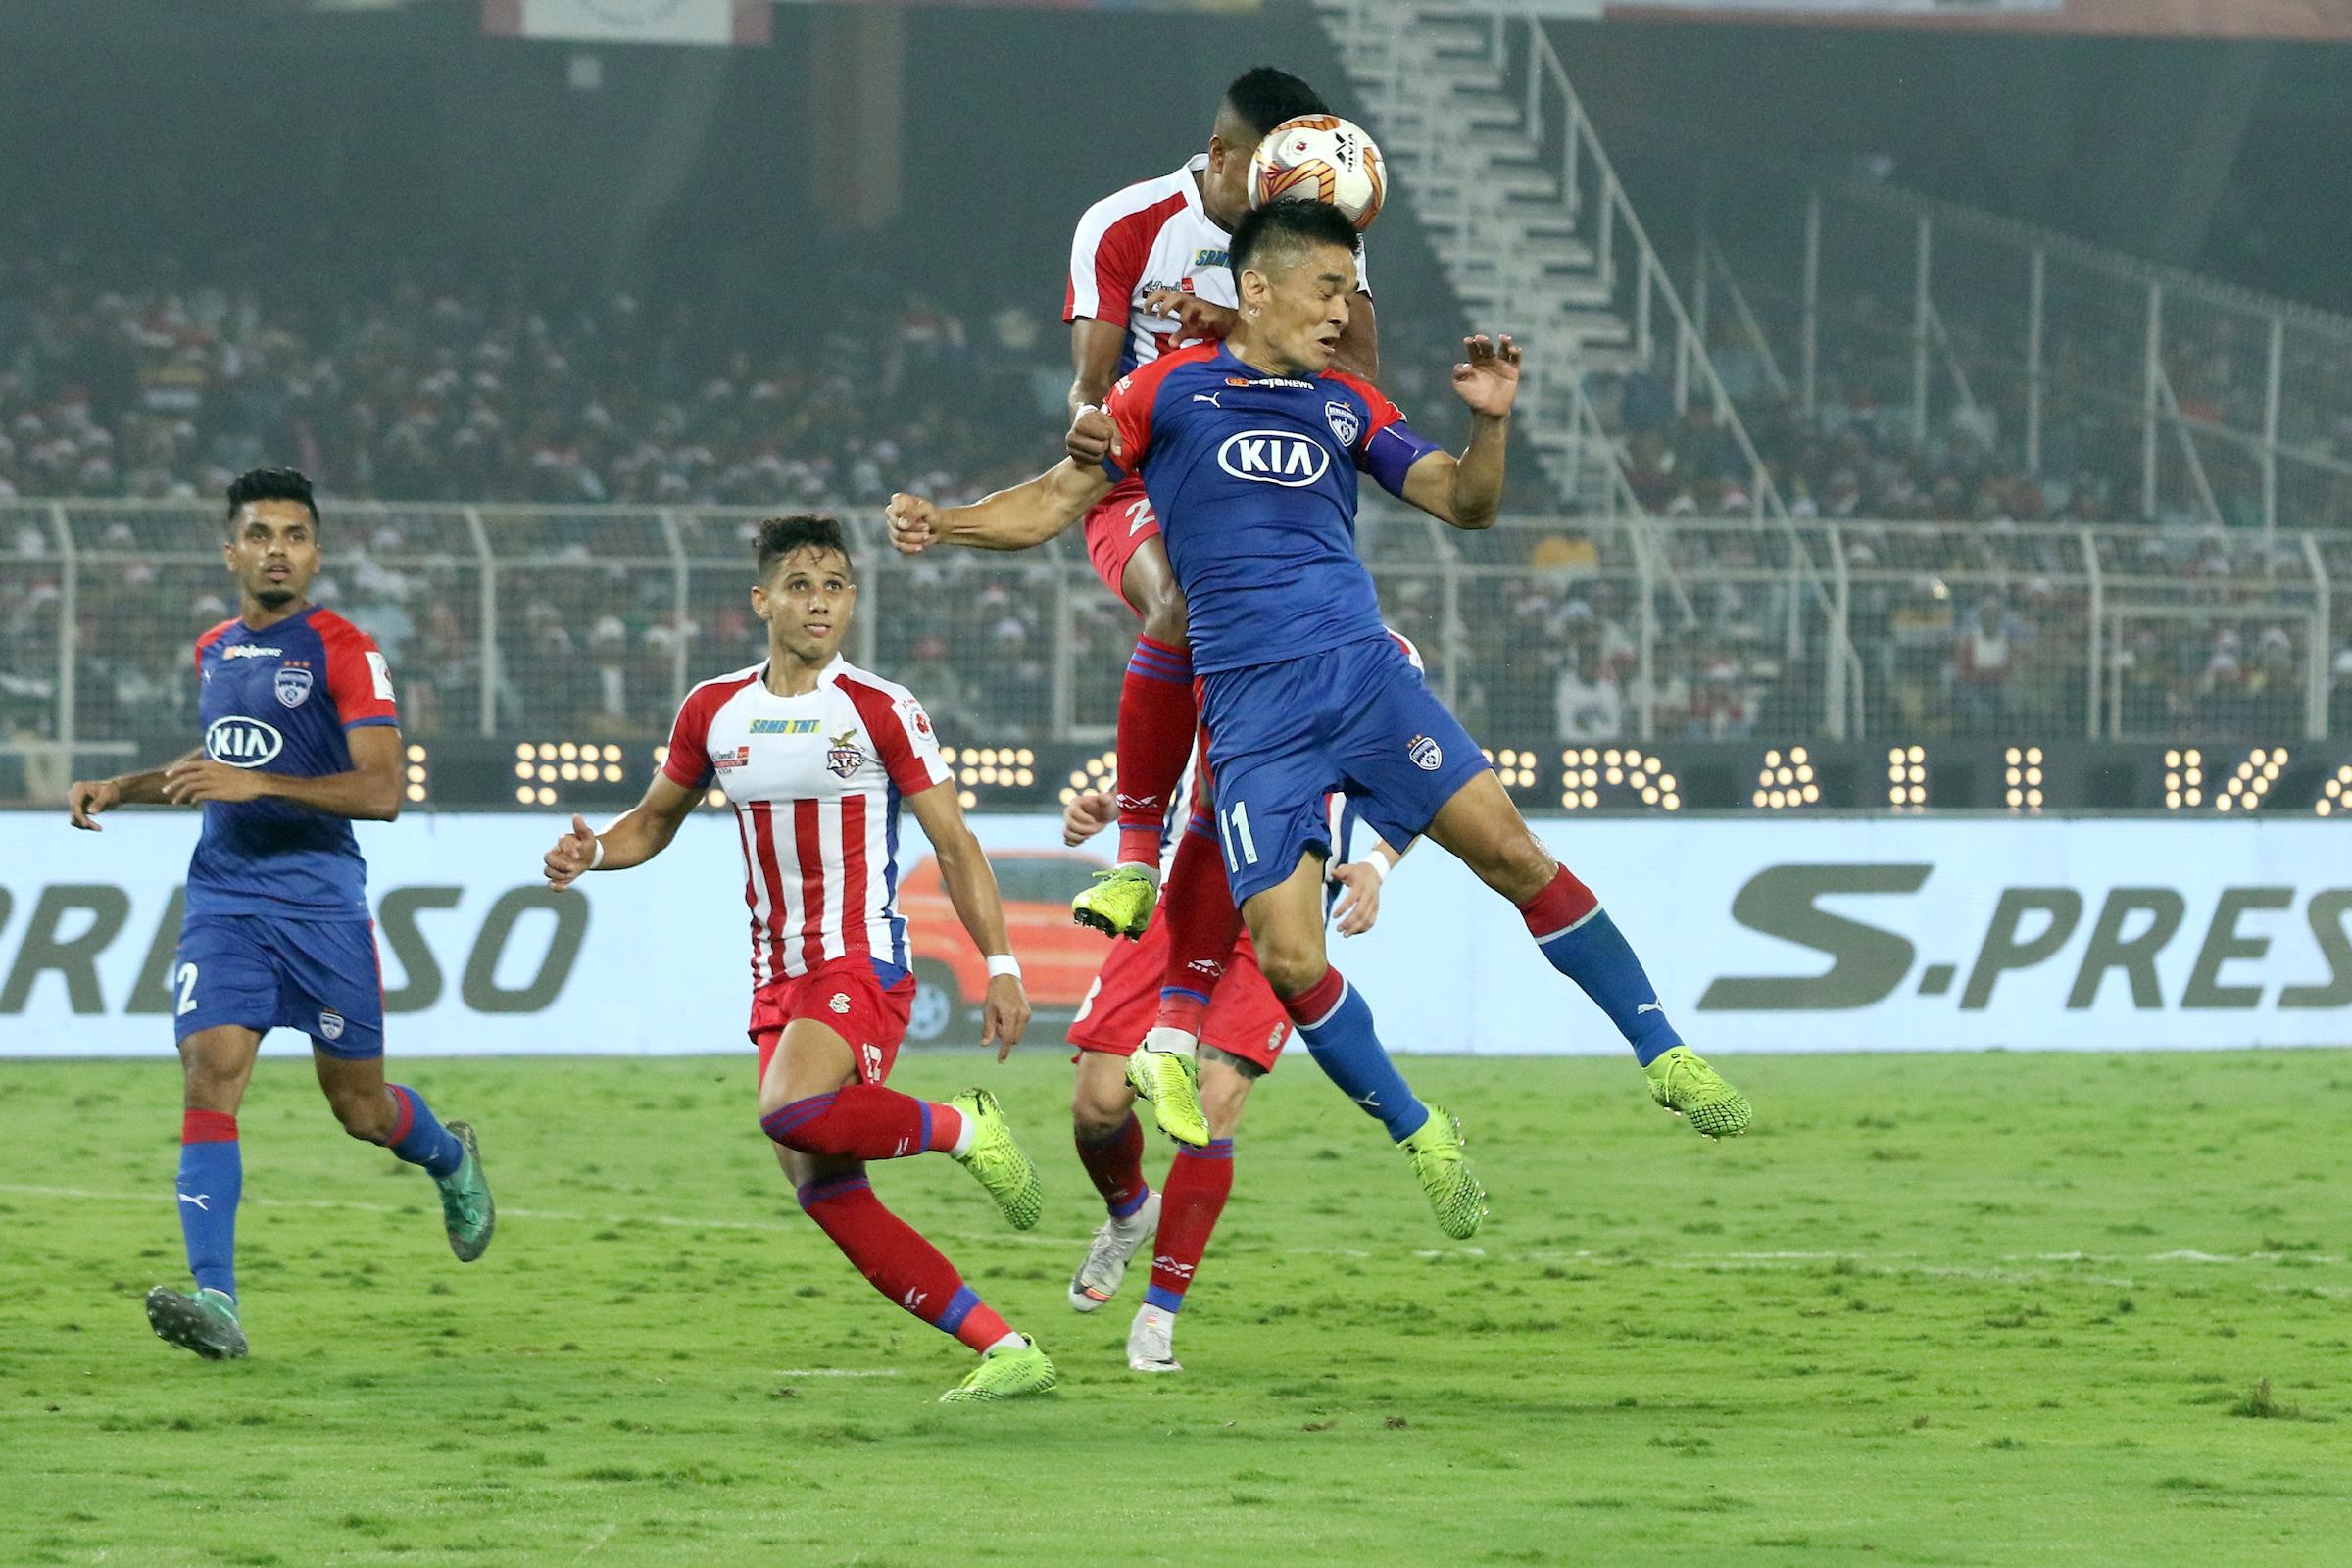 ATK vs BFC Sunil Chhetri